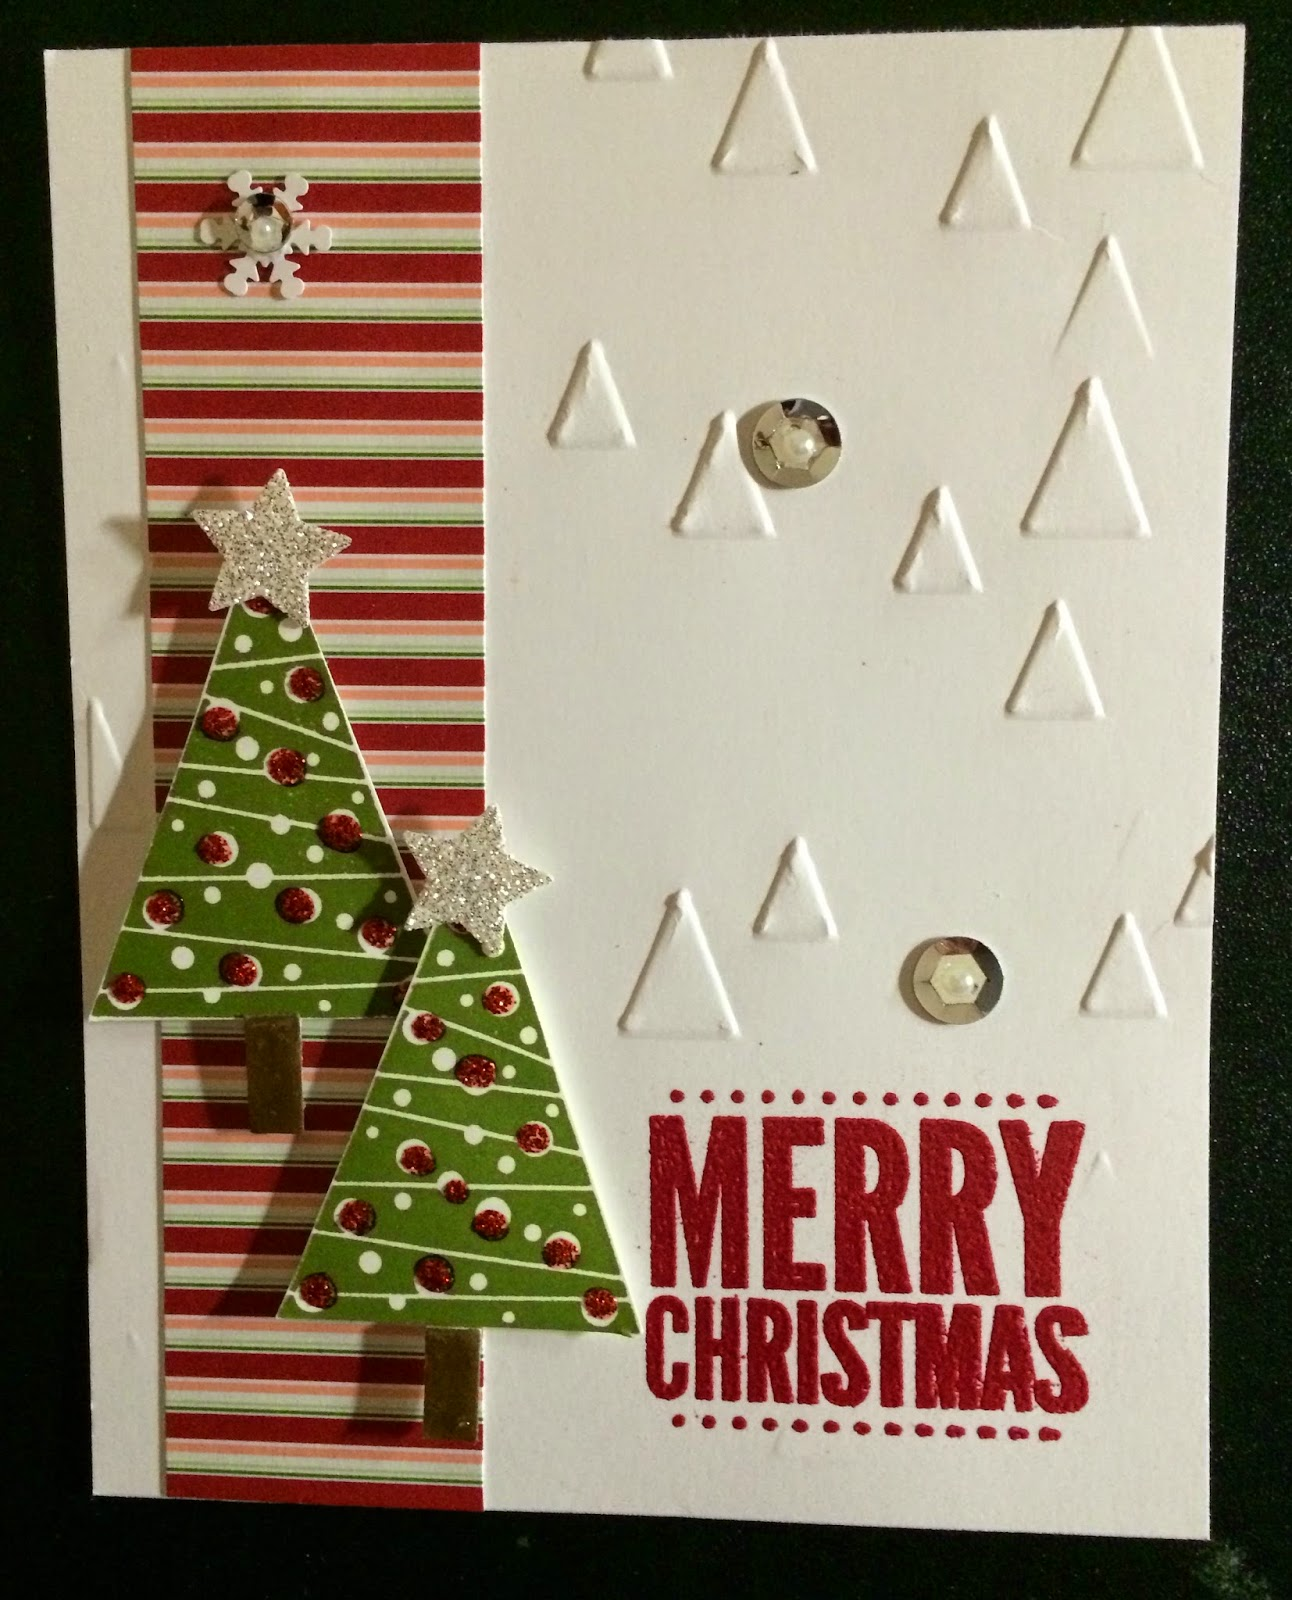 Christmas Tree Merry Christmas: Kards By Kadie: Merry Christmas Festival Of Trees